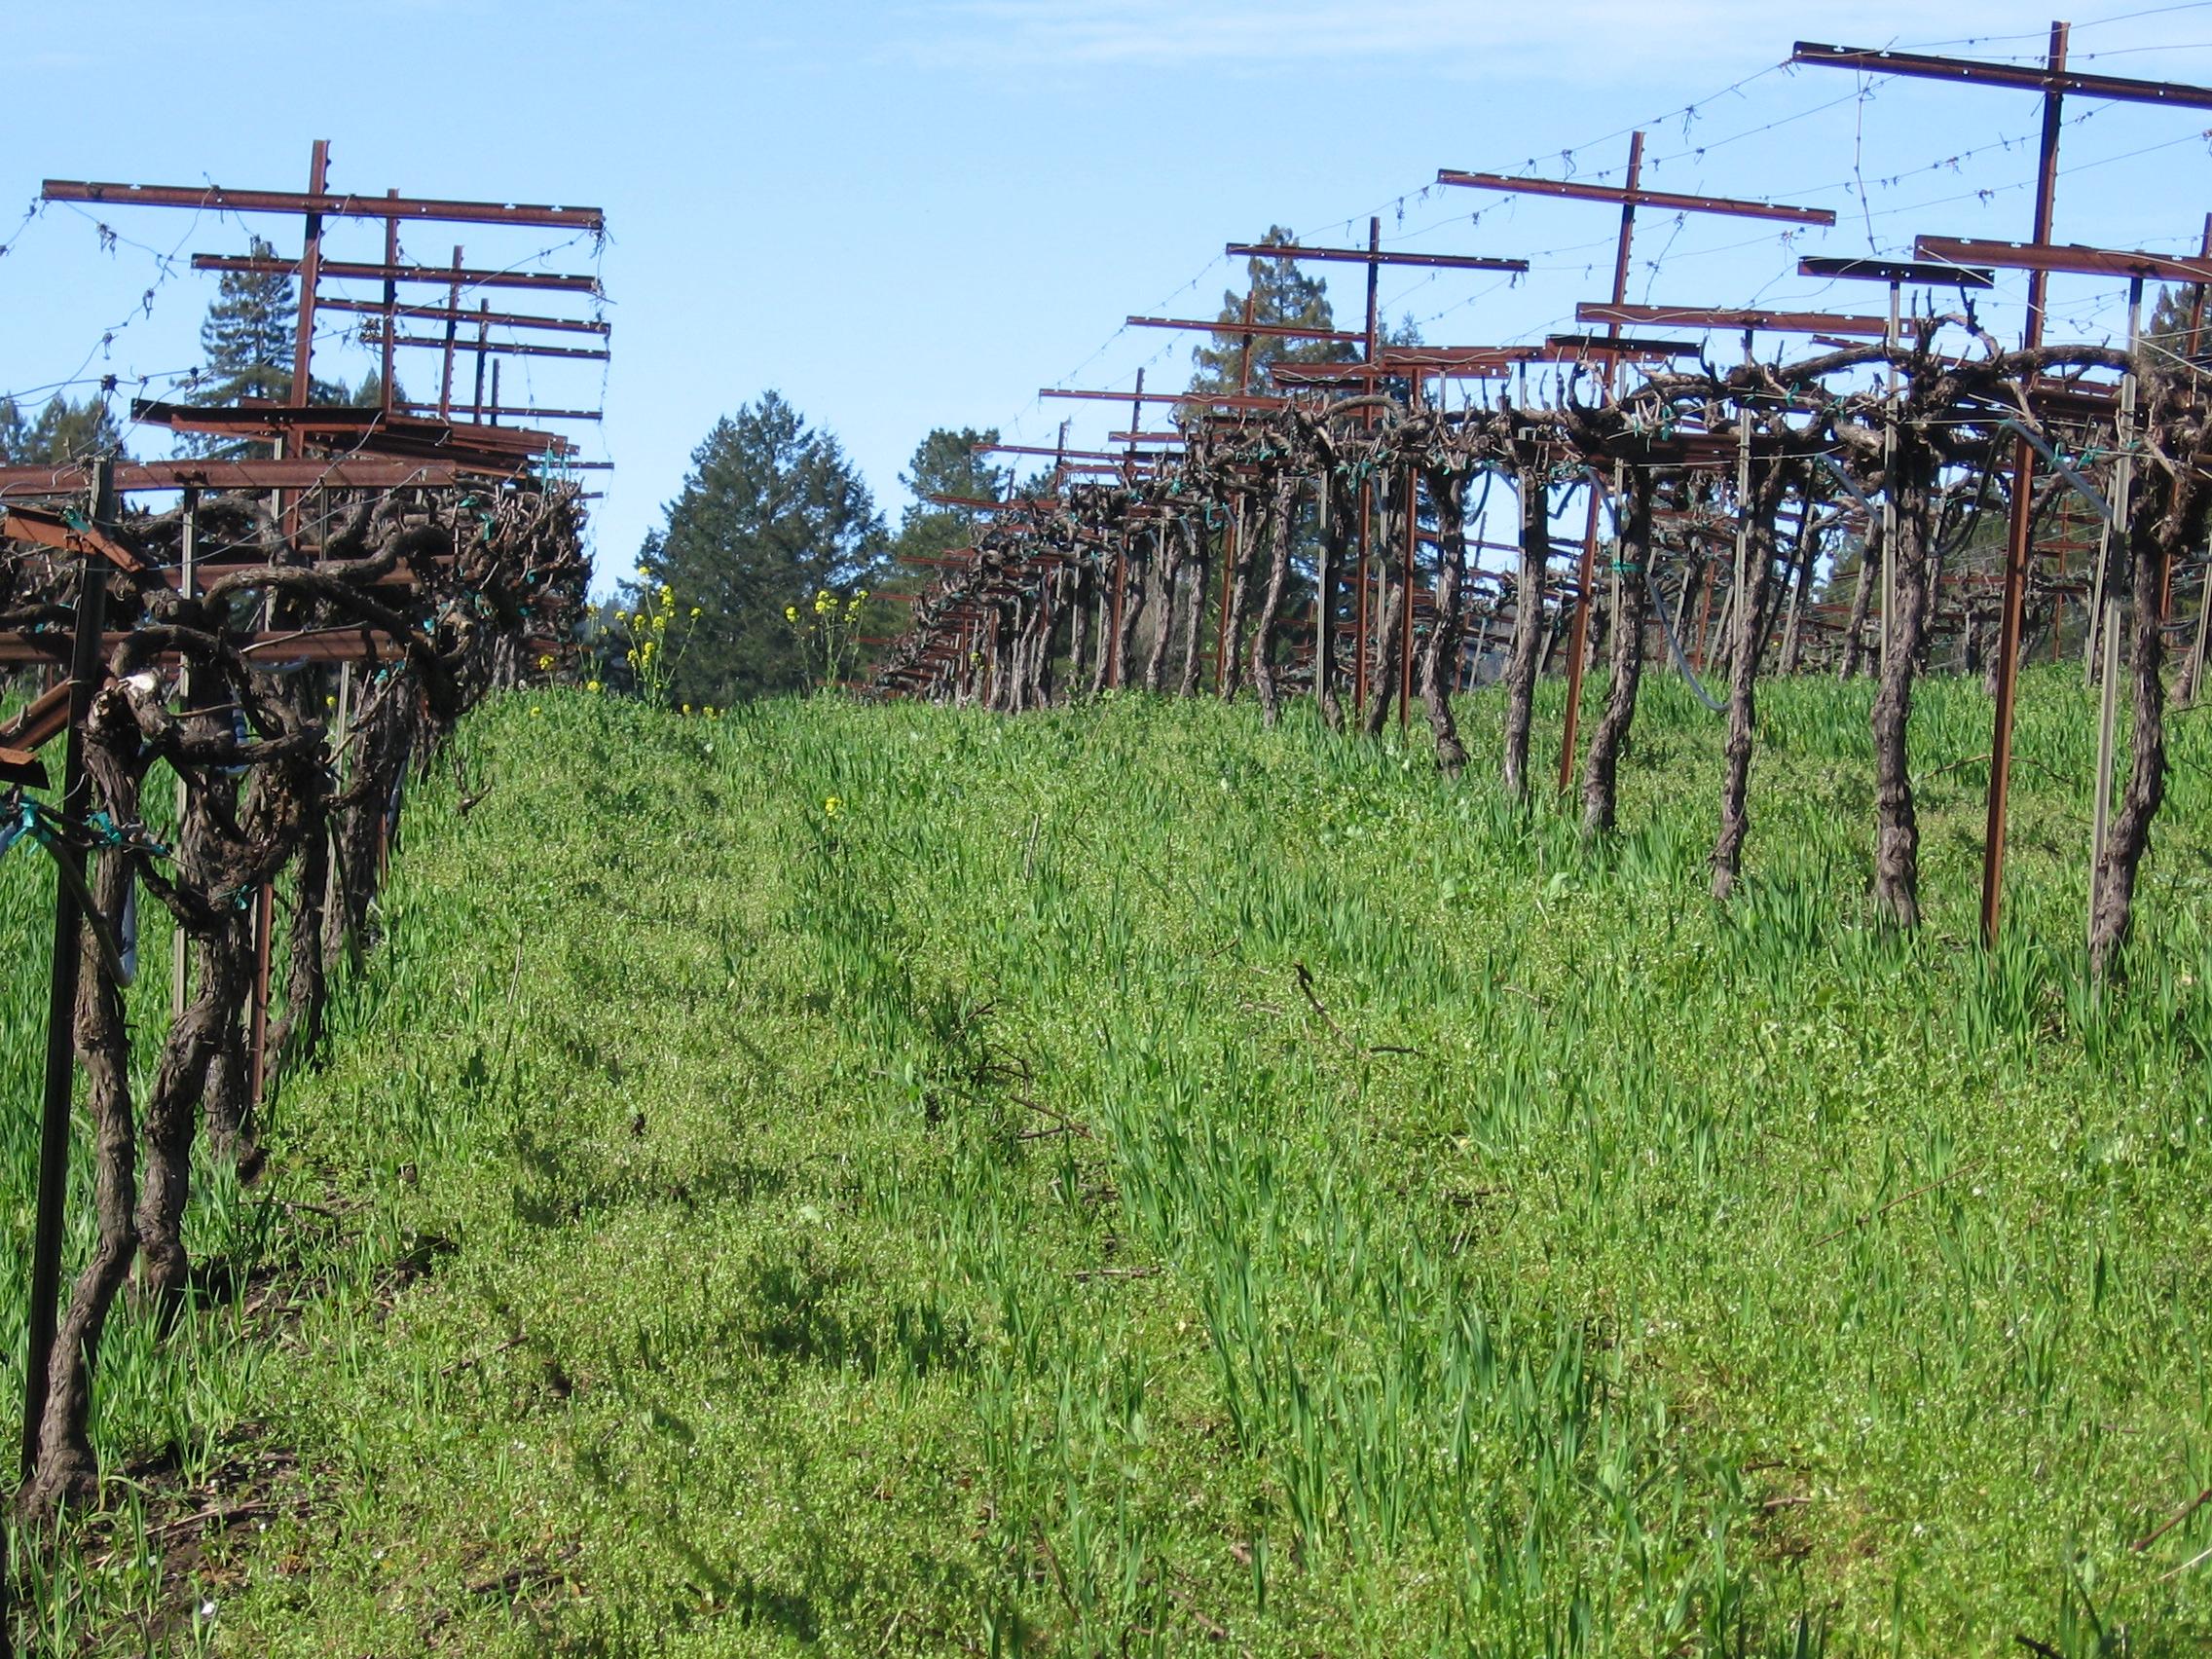 Dormant vines at Heintz copy.JPG